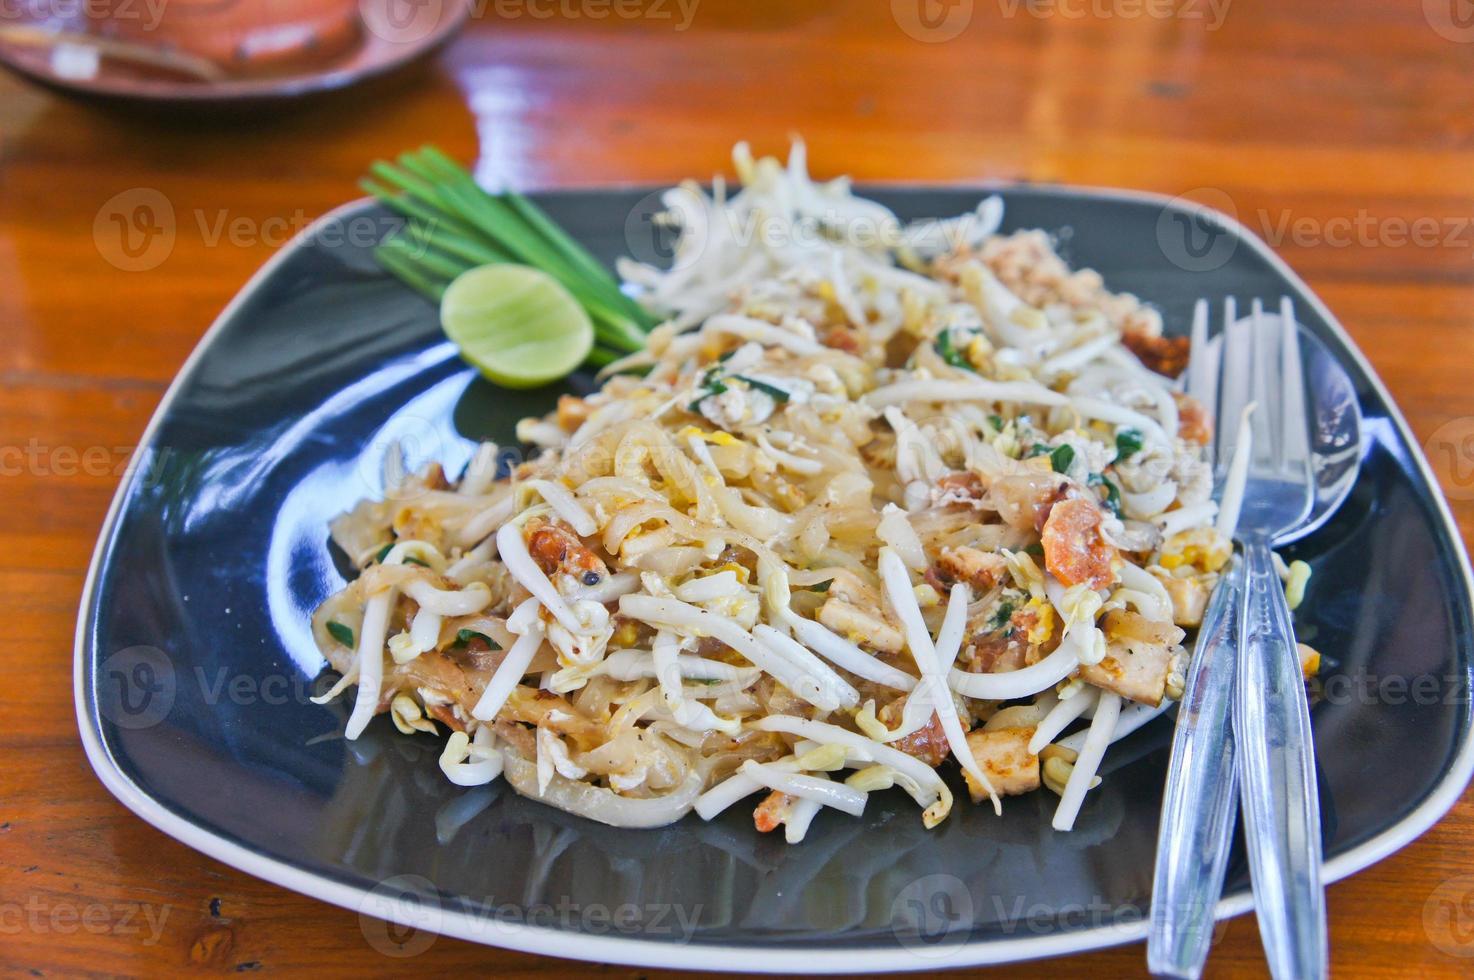 pad thai traditionell måltid i Thailand cusine foto